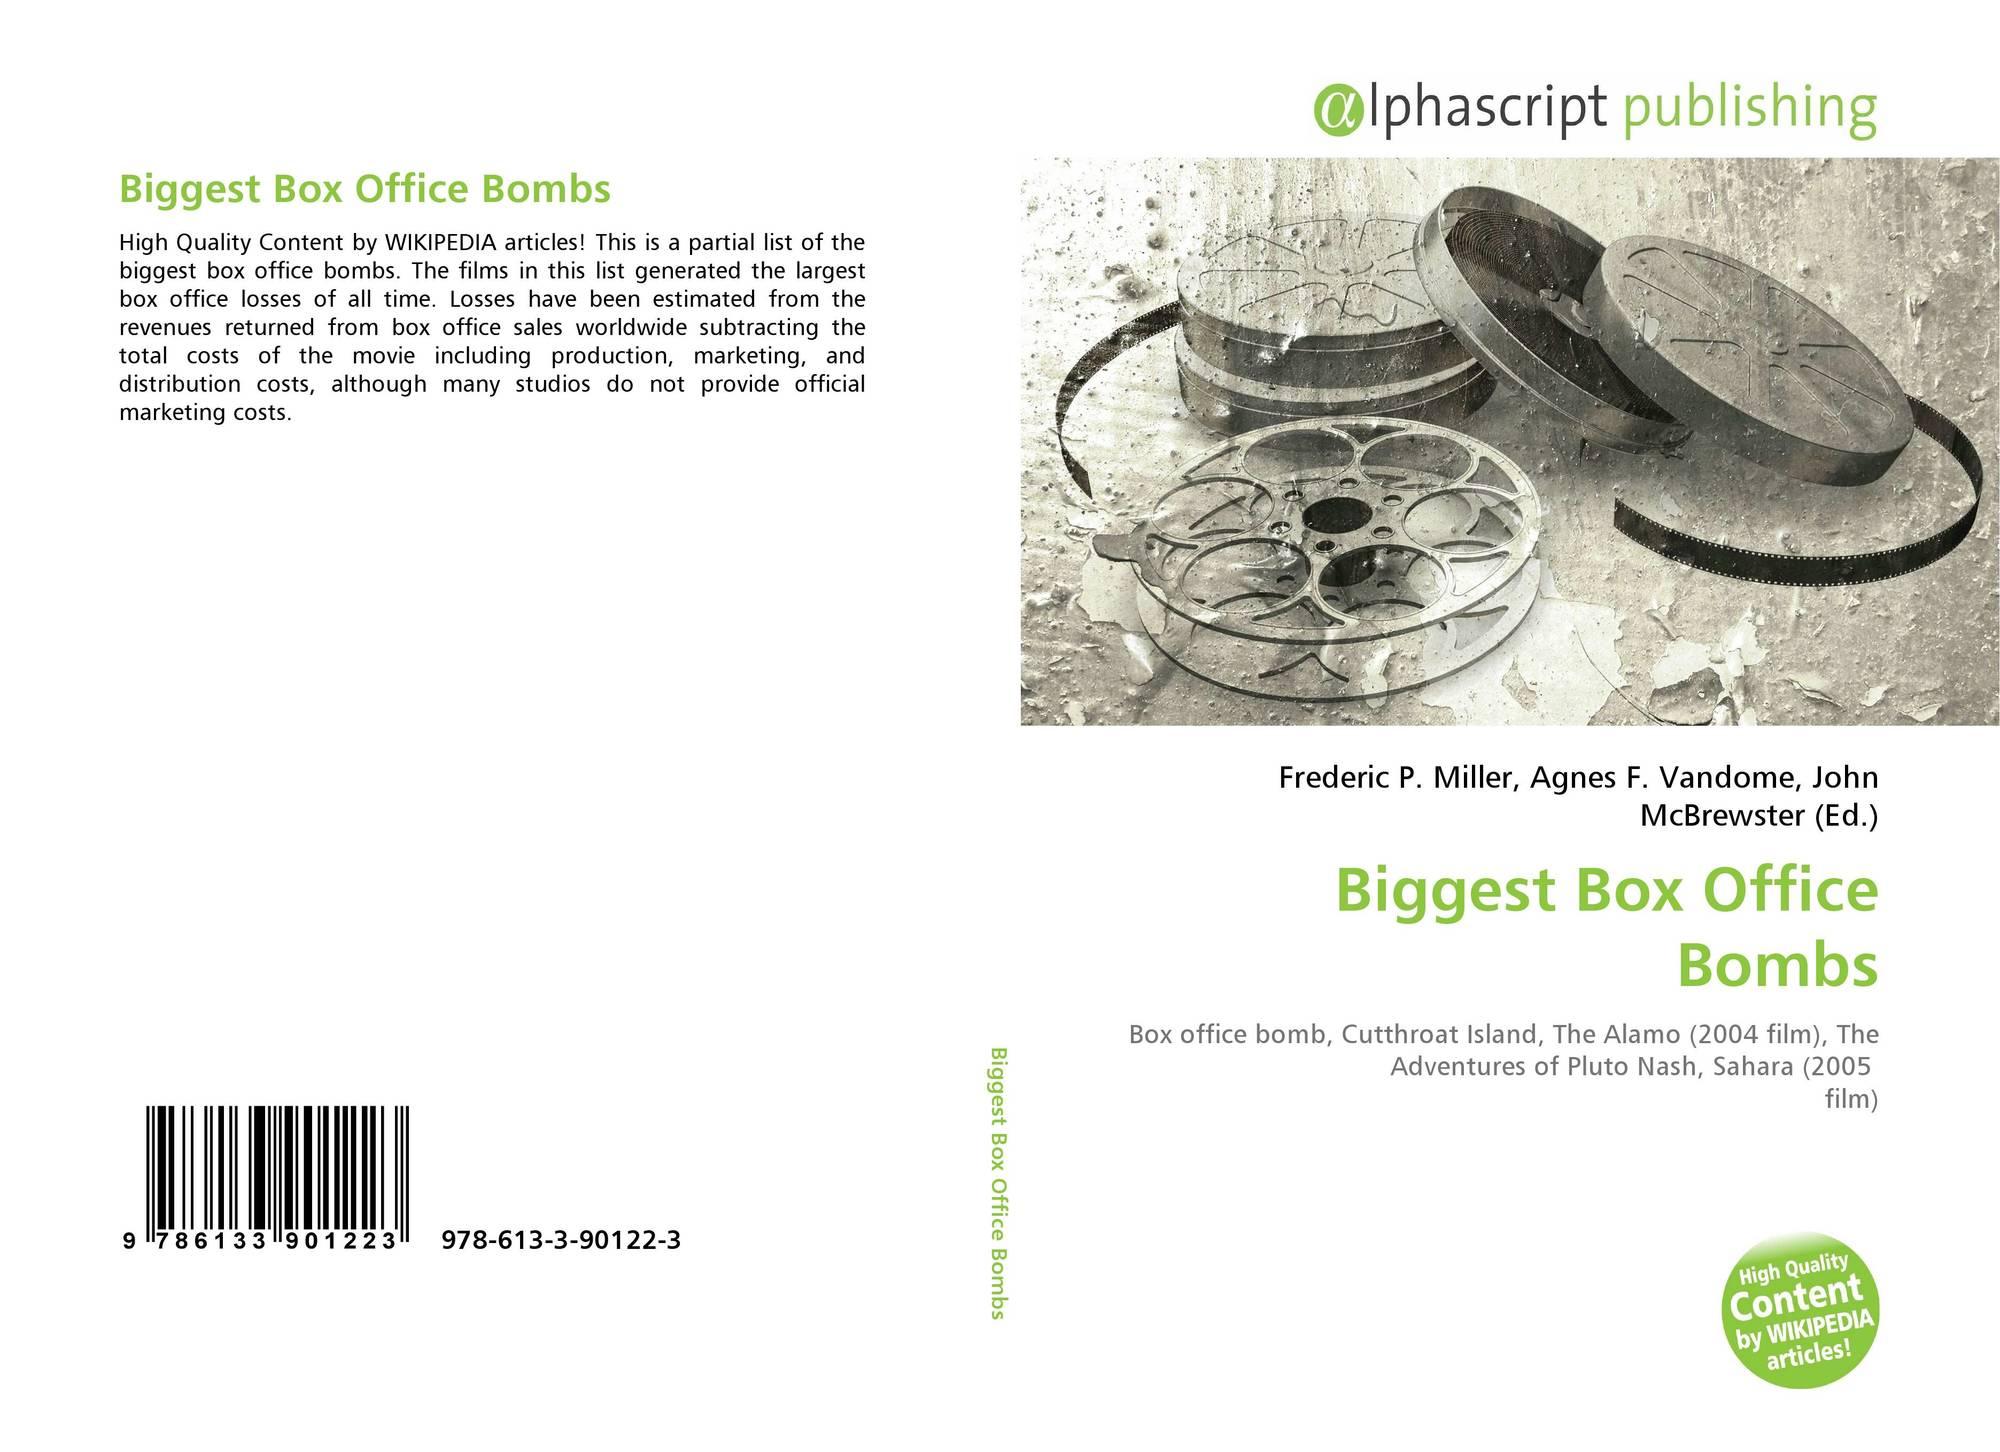 Biggest Box Office Bombs, 978-613-3-90122-3, 6133901225 ,9786133901223